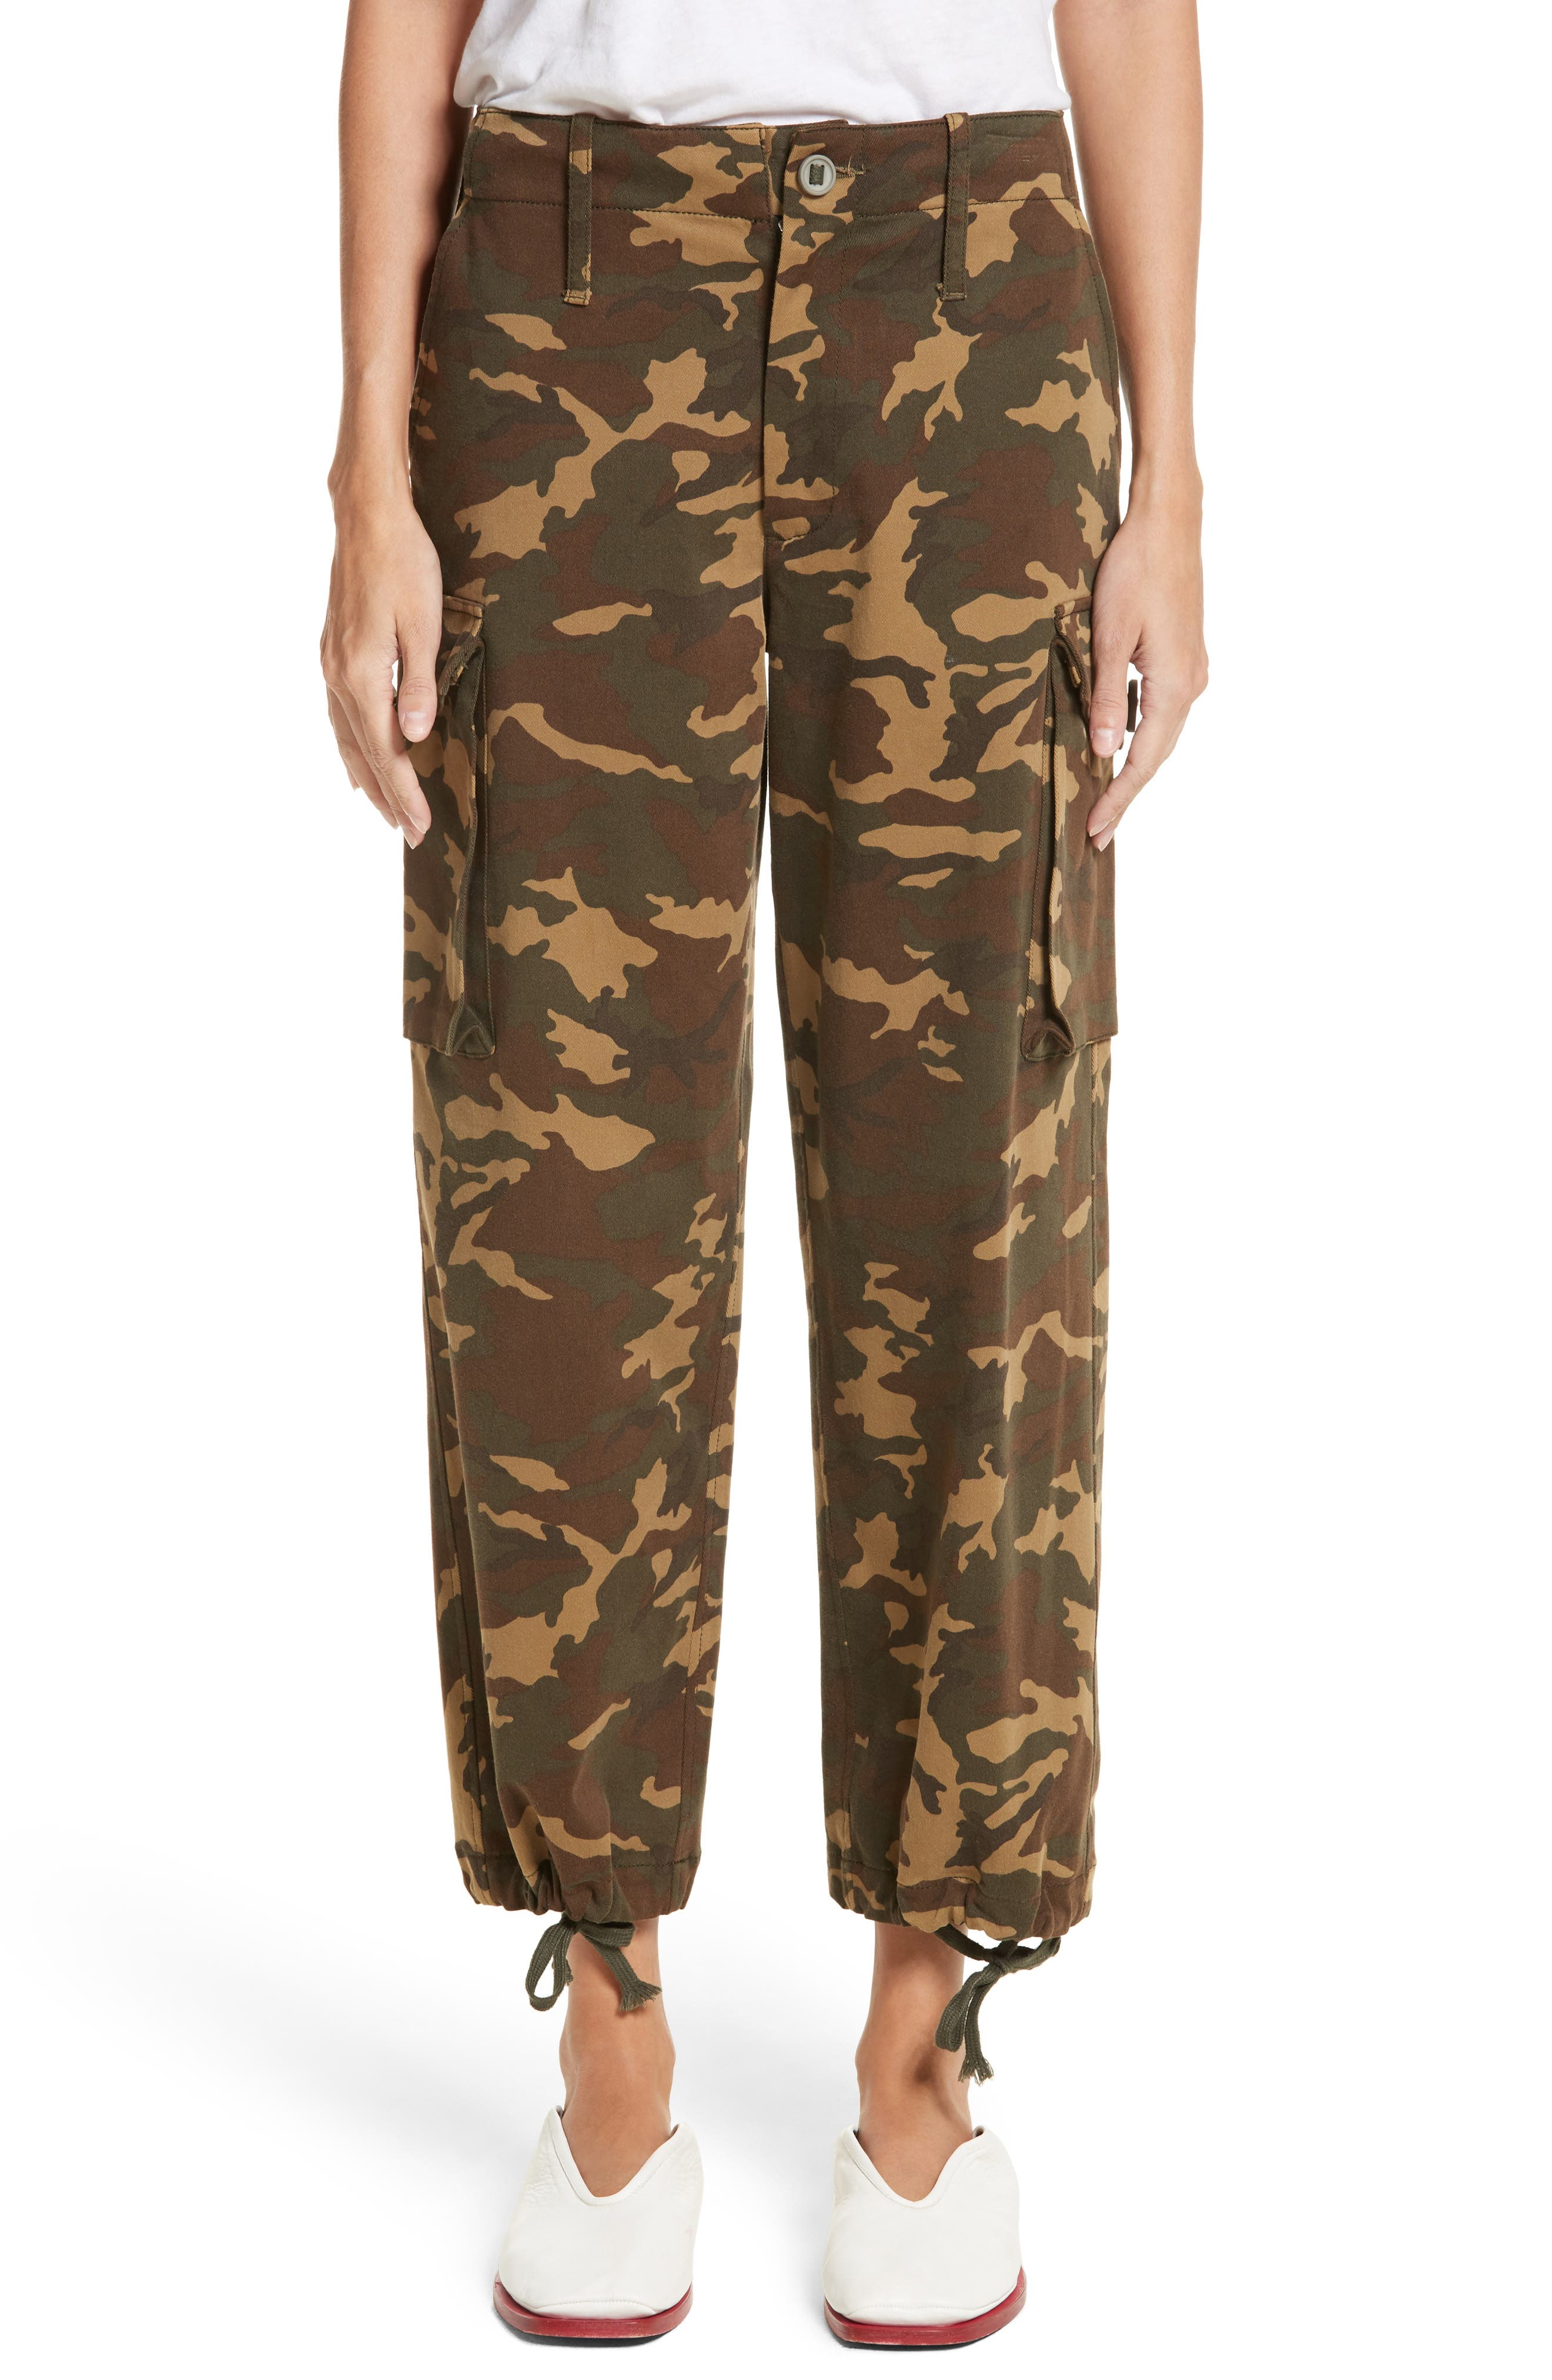 PSWL Camouflage Stretch Cotton Pants,                         Main,                         color, Camo